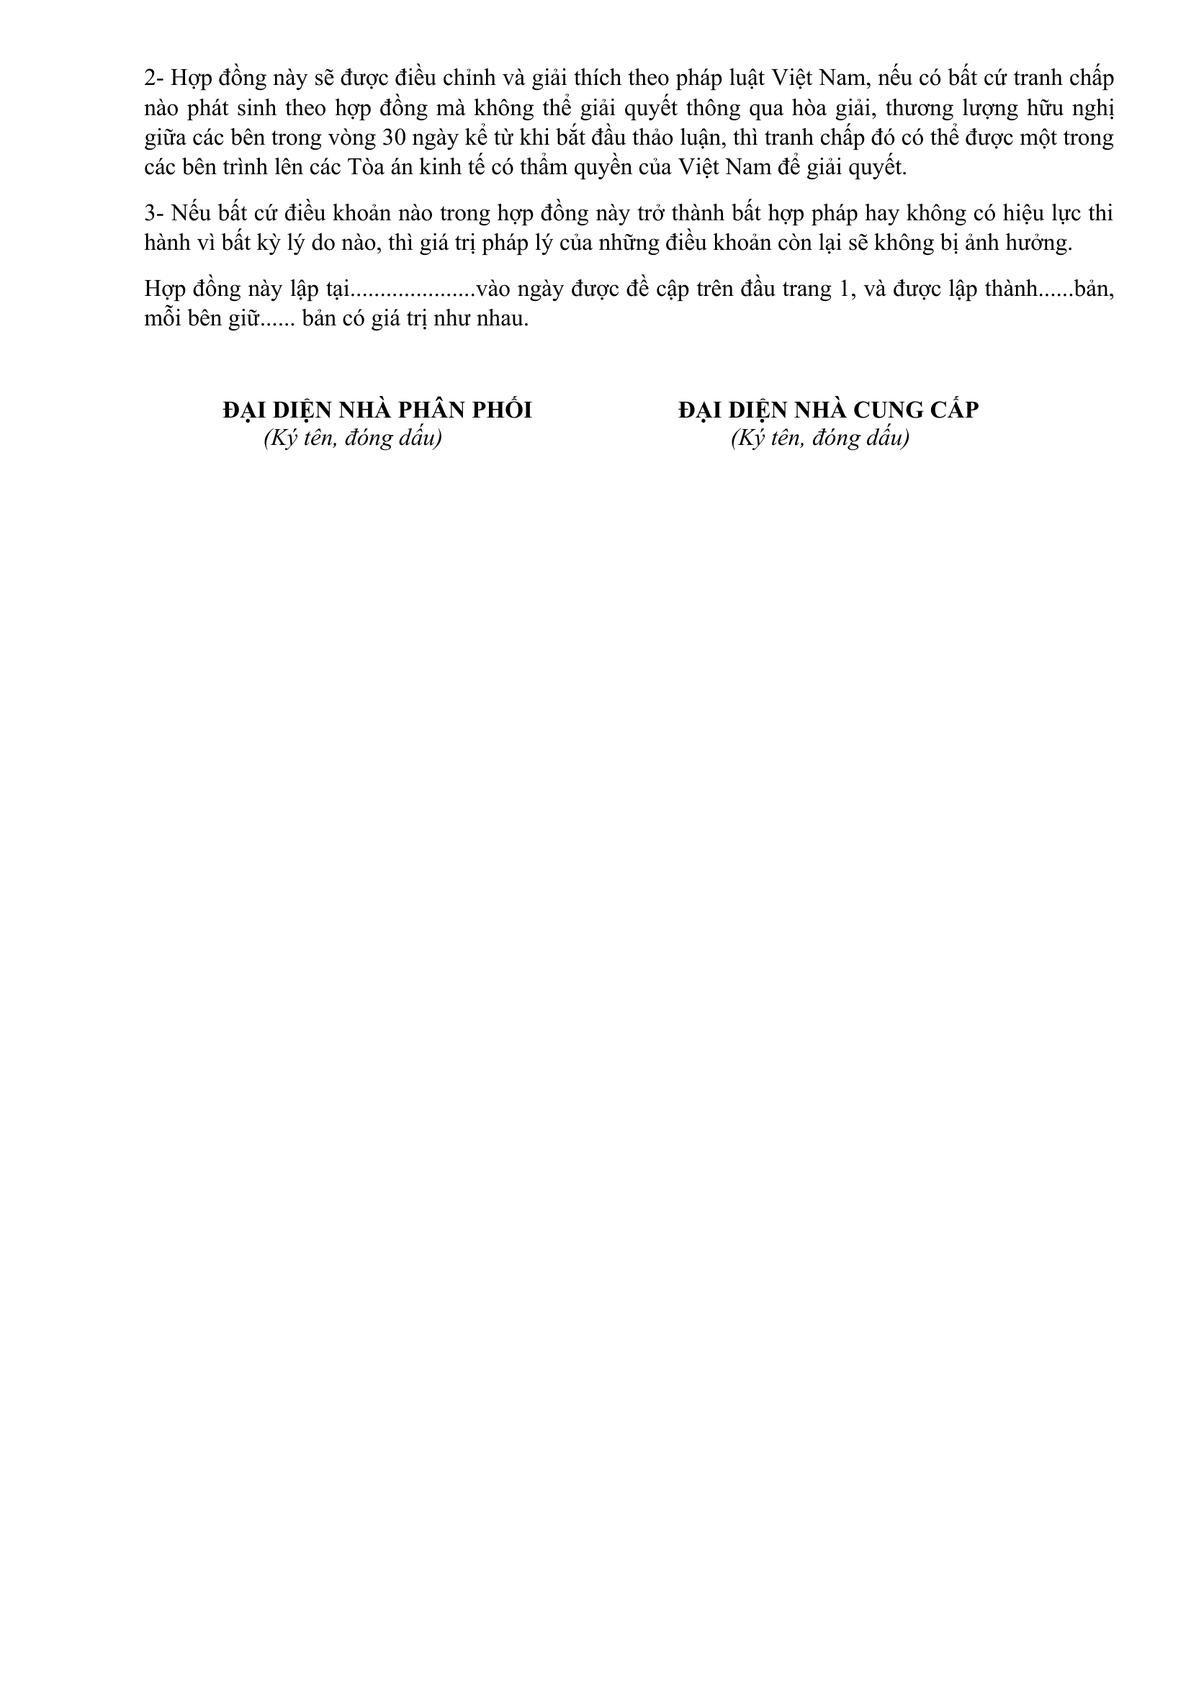 Goods Distribution Agreement-1